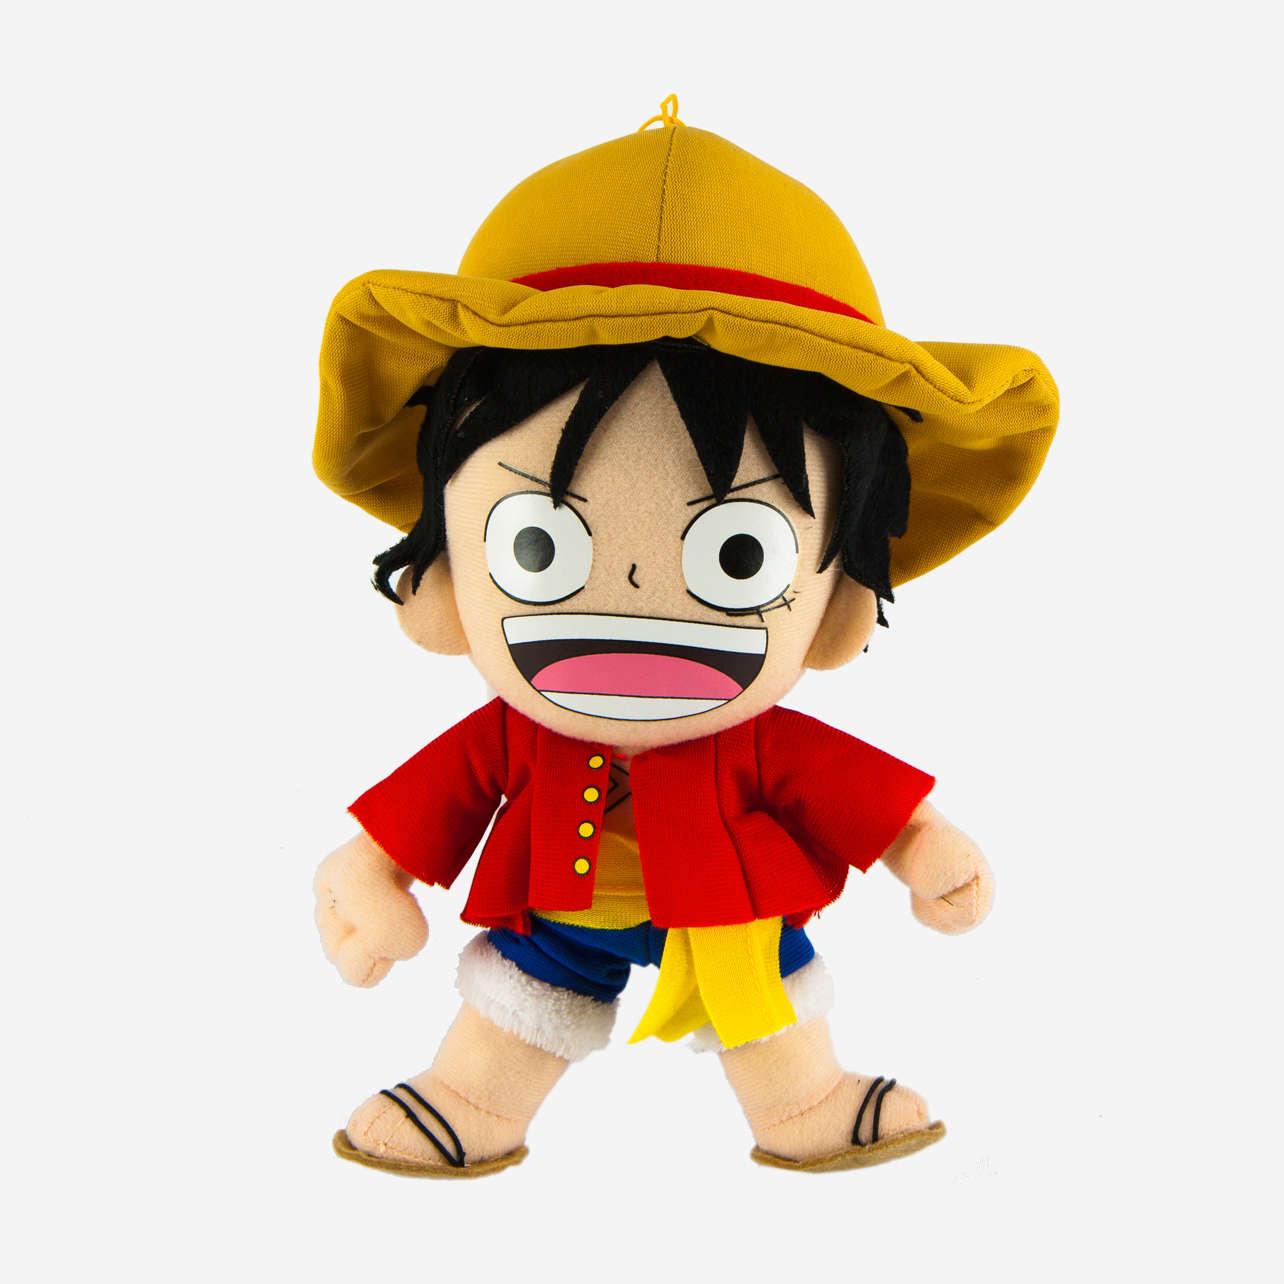 Luffy Plush 8'' toys-games